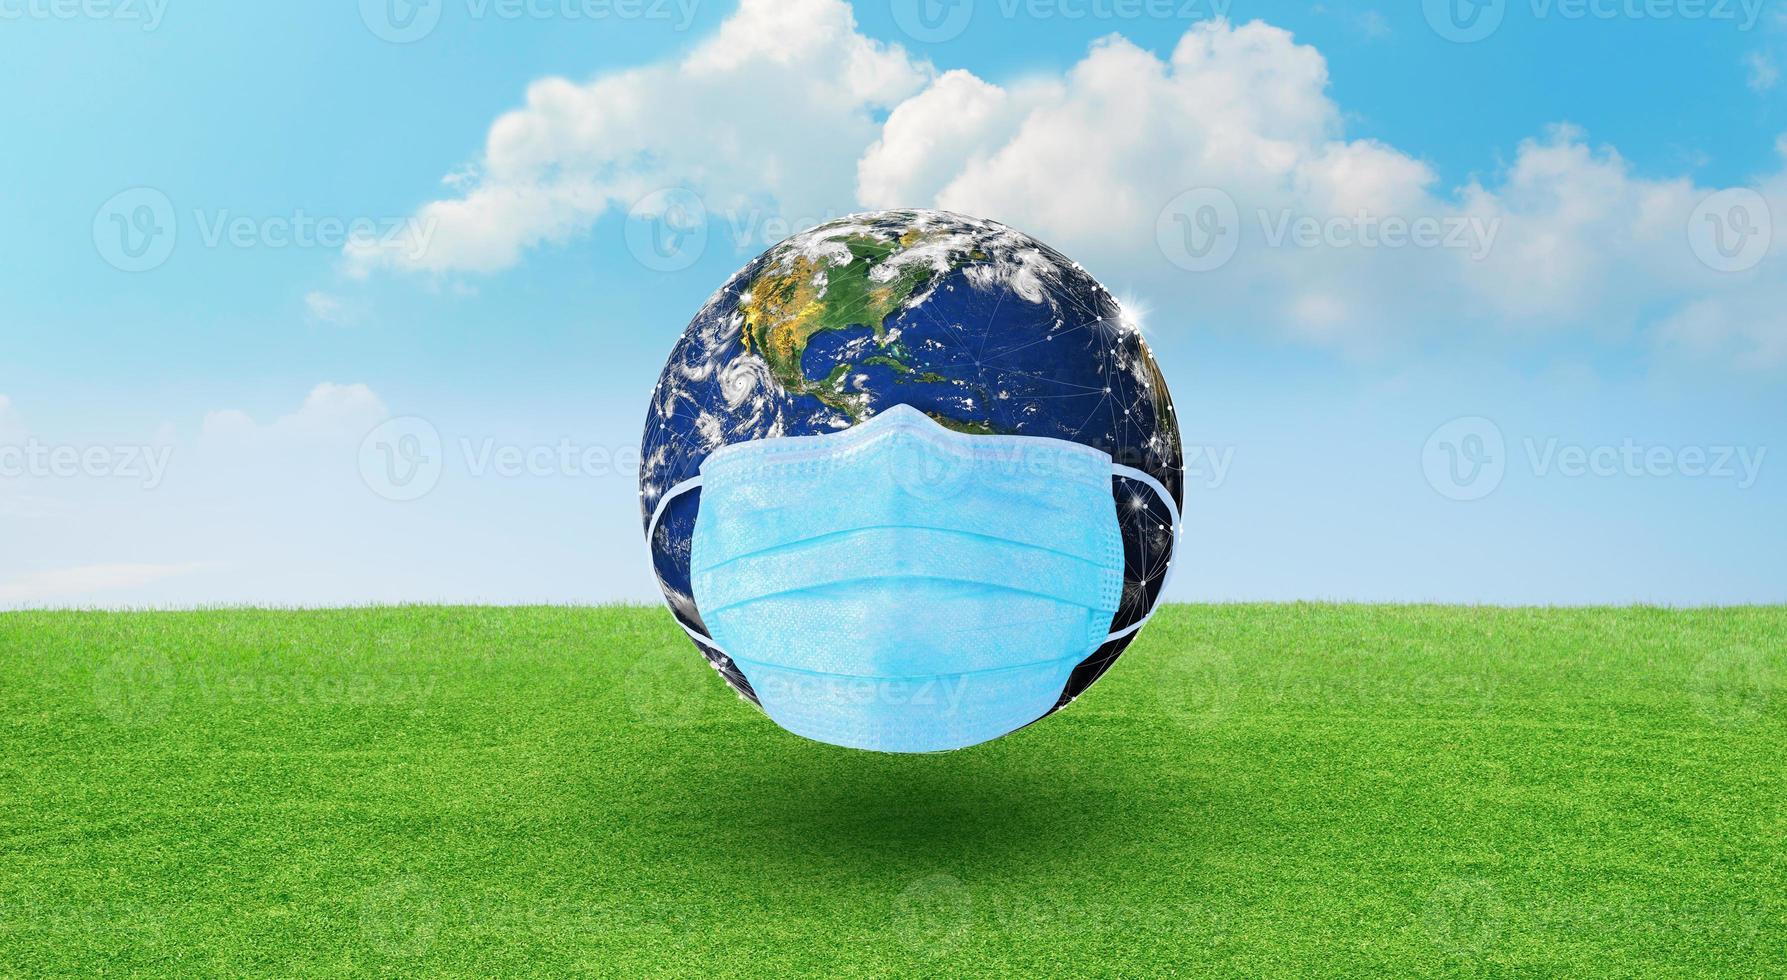 World Corona virus or COVID-19 attack and Earth Day concept. photo